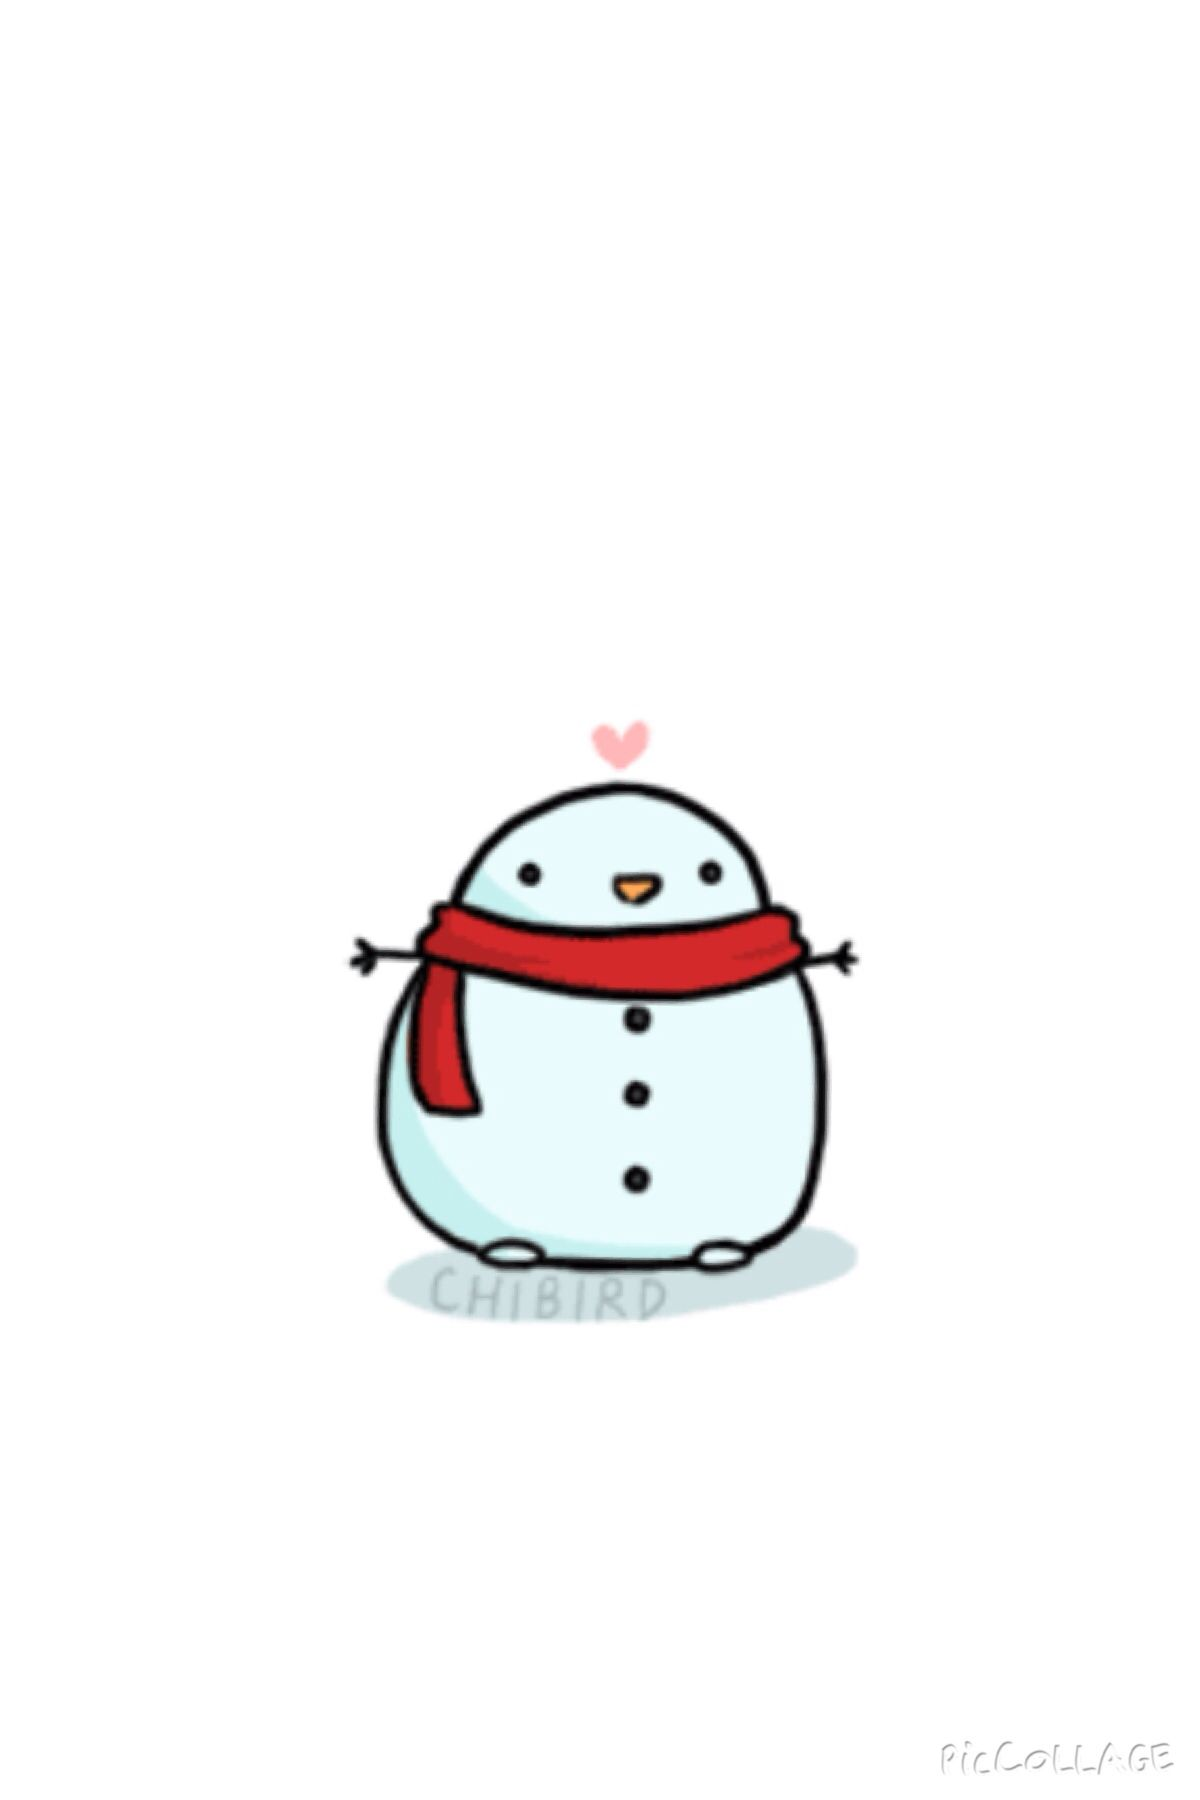 Chibird KAWAII Pinterest Doodles Creativity And